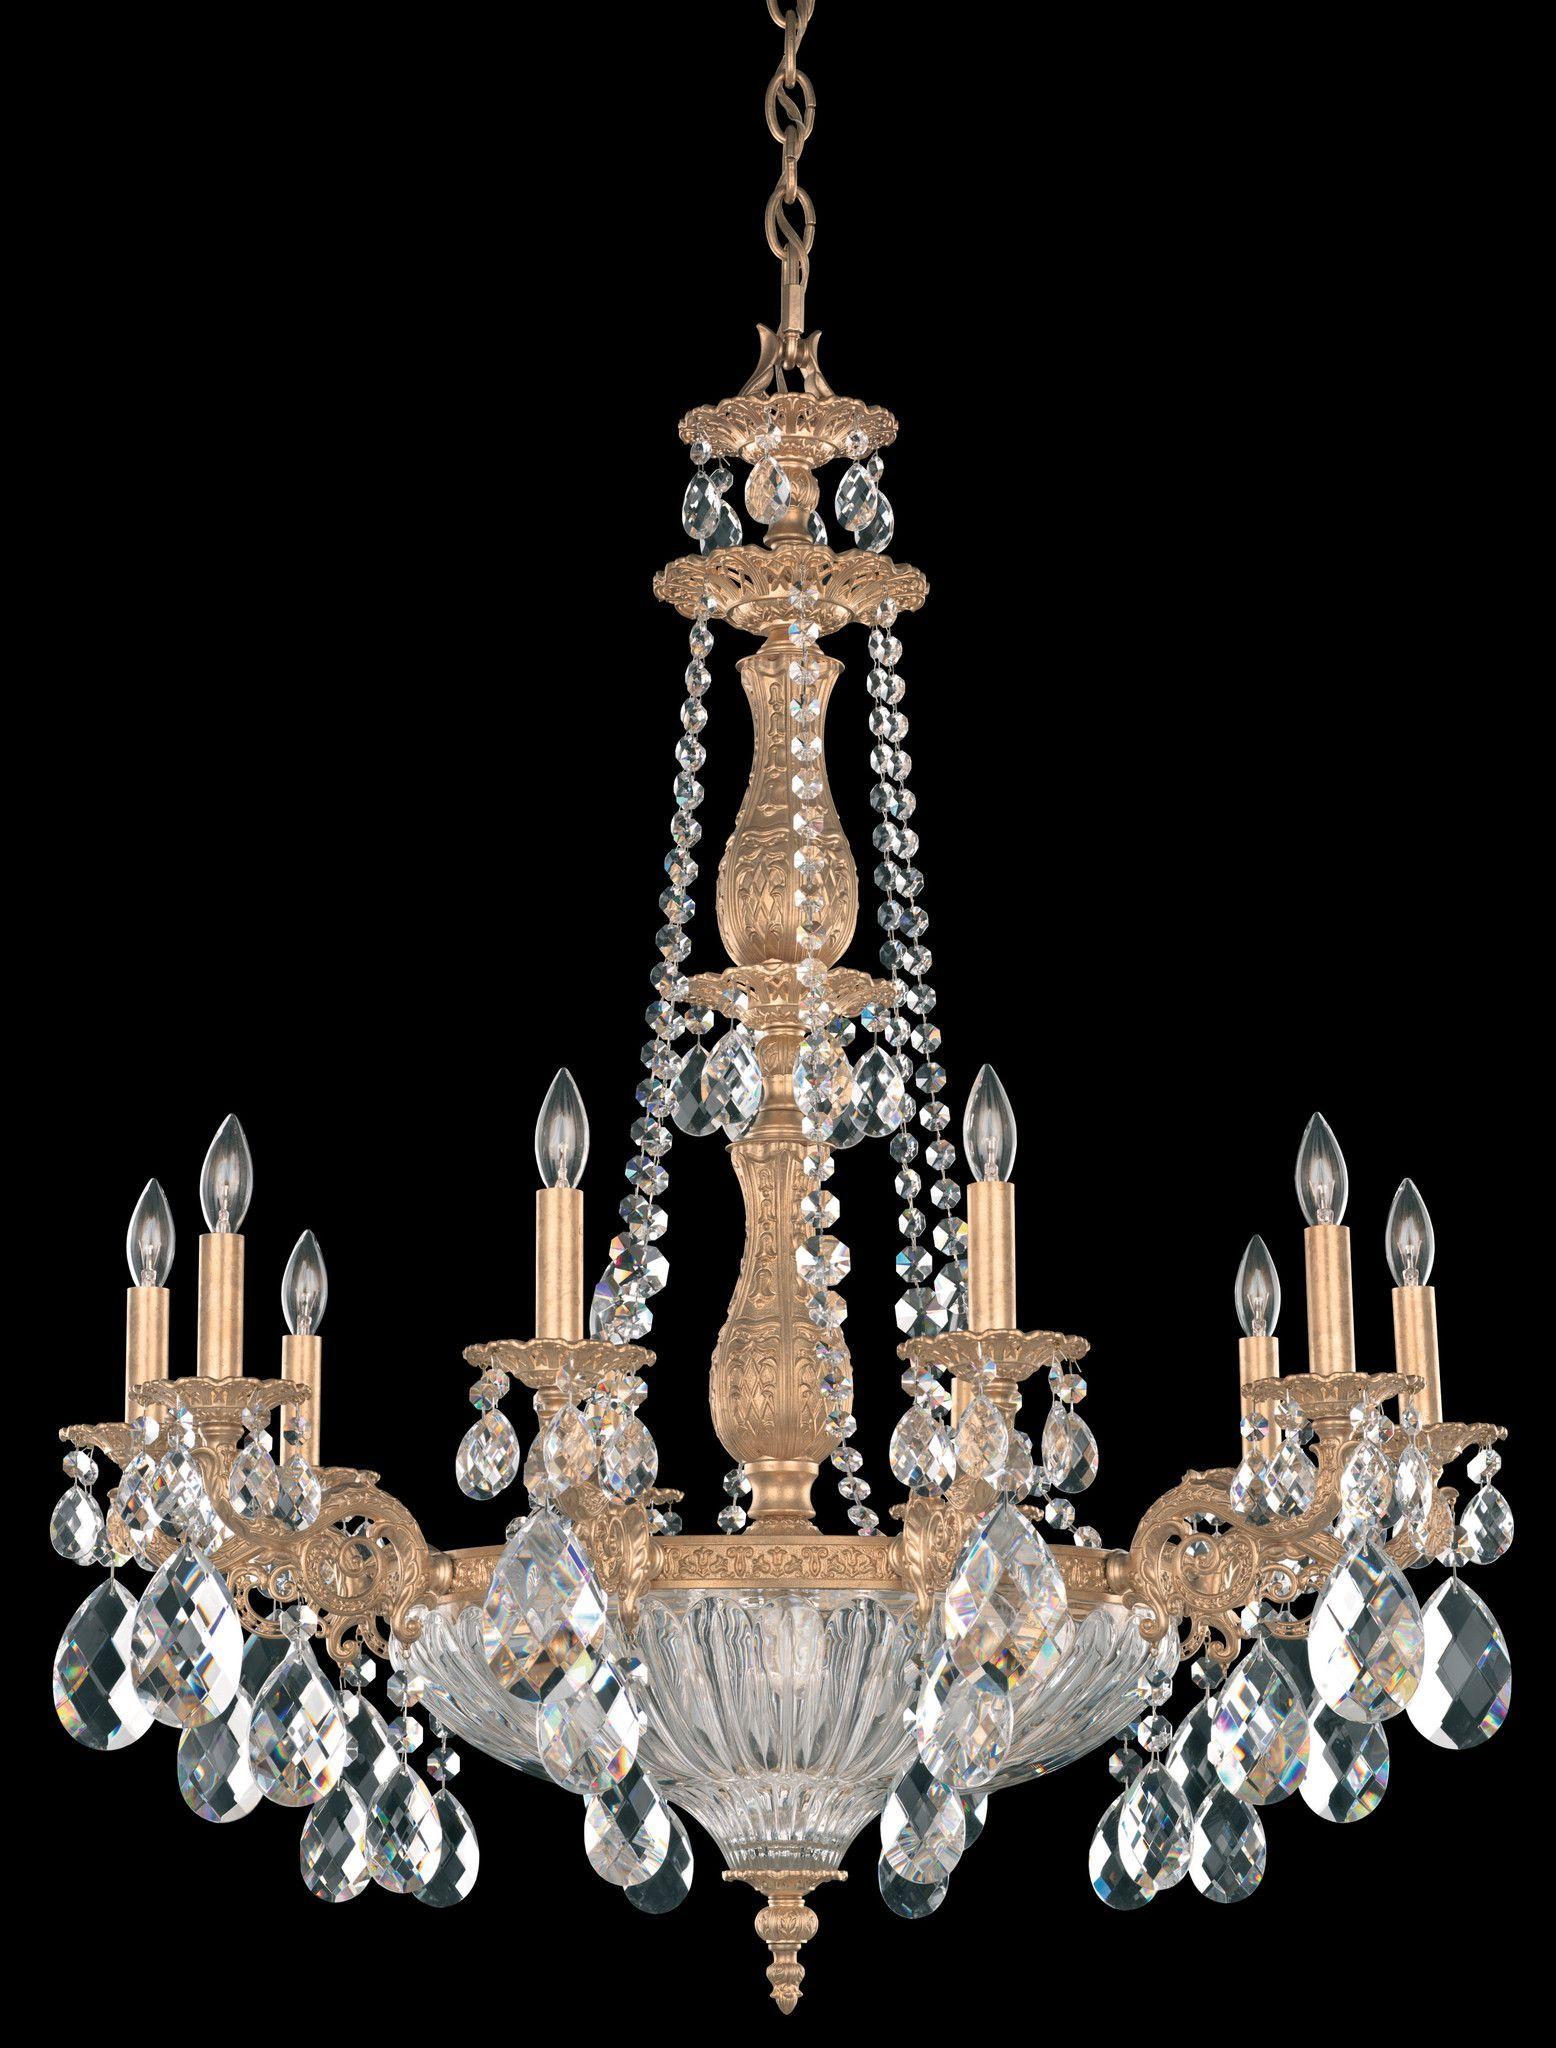 Schonbek 5693 milano 30 inch chandelier pinterest schonbek 5693 milano 30 inch chandelier arubaitofo Gallery